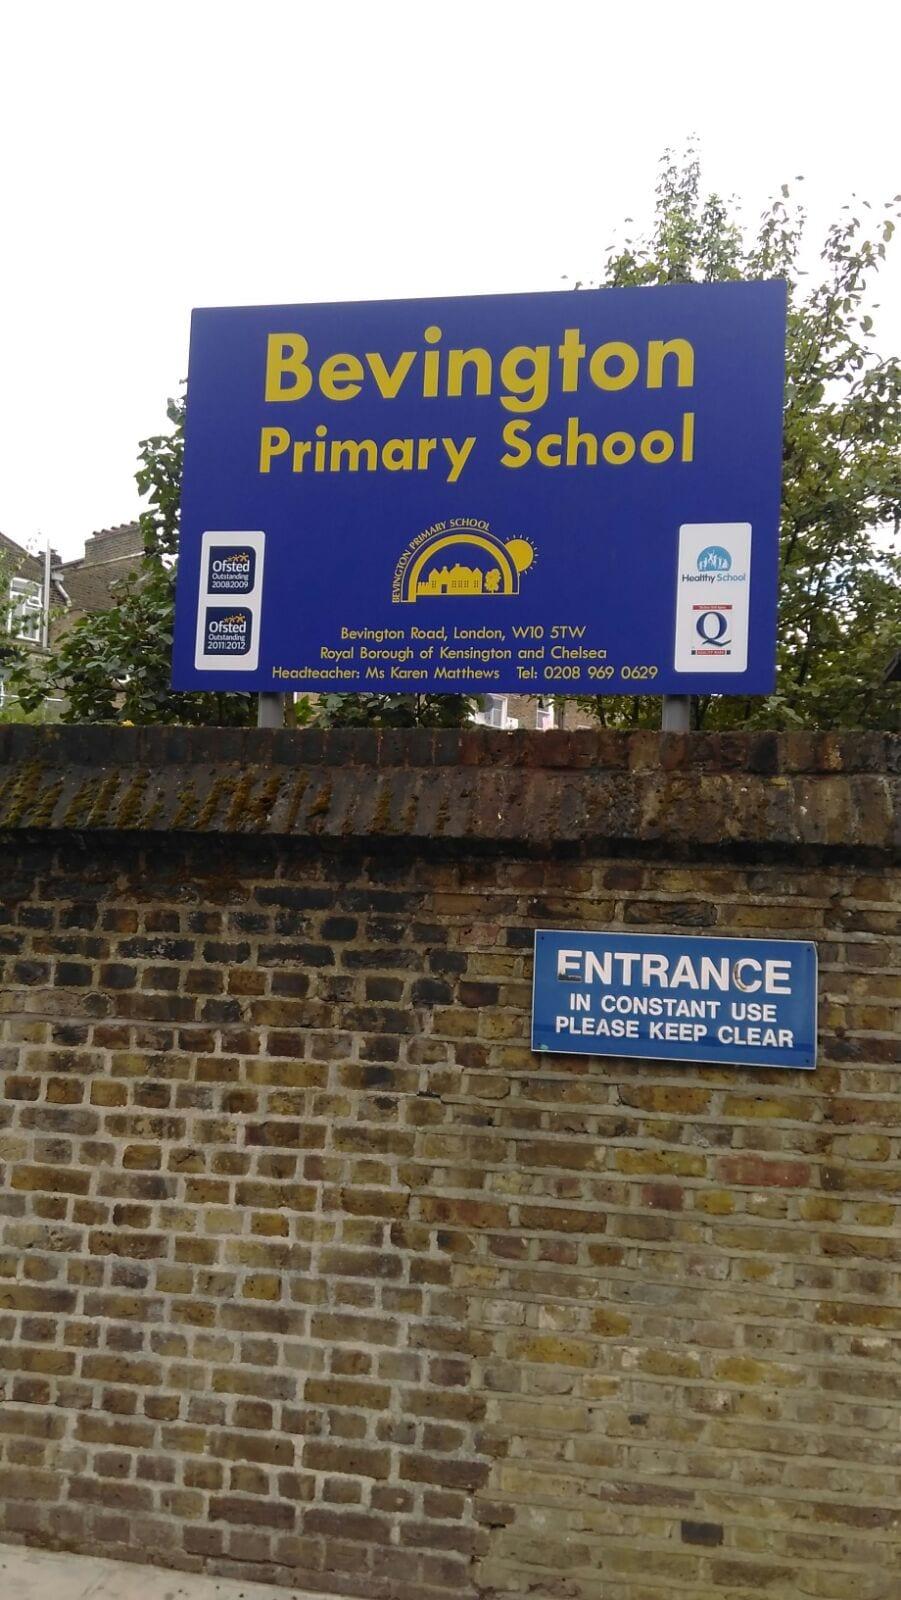 Bevington Primary School Kensington vinyl graphics